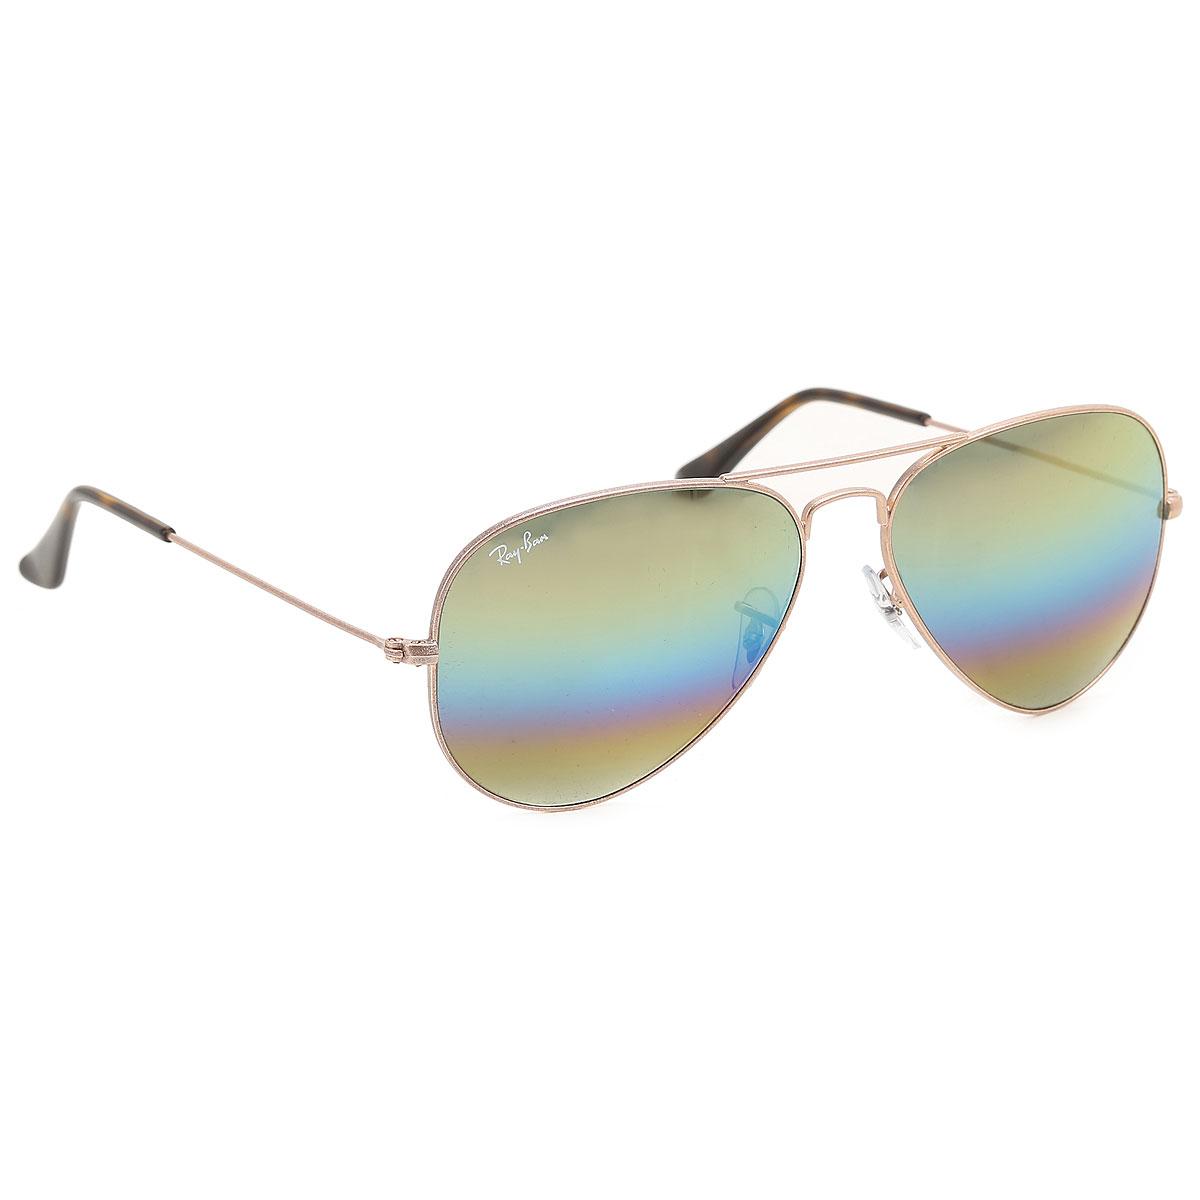 Ray Ban Sunglasses On Sale, Light Bronze, 2019